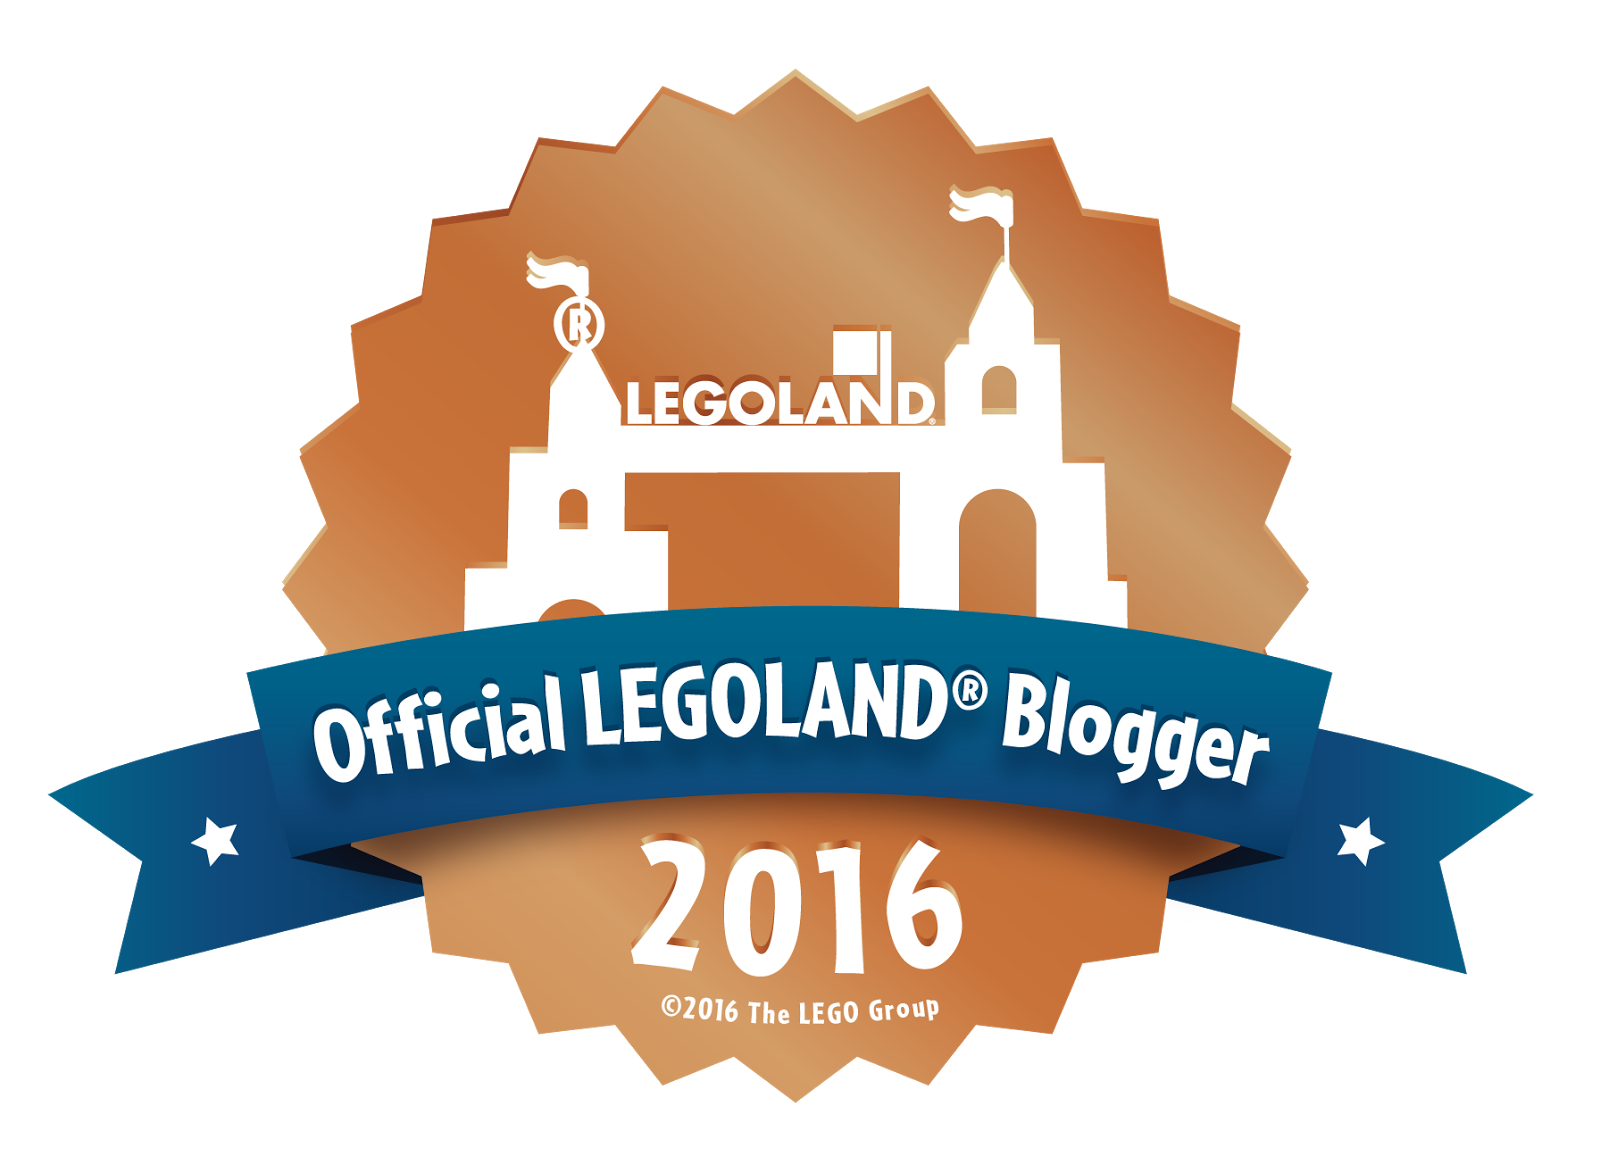 2016 Official Legoland Blogger